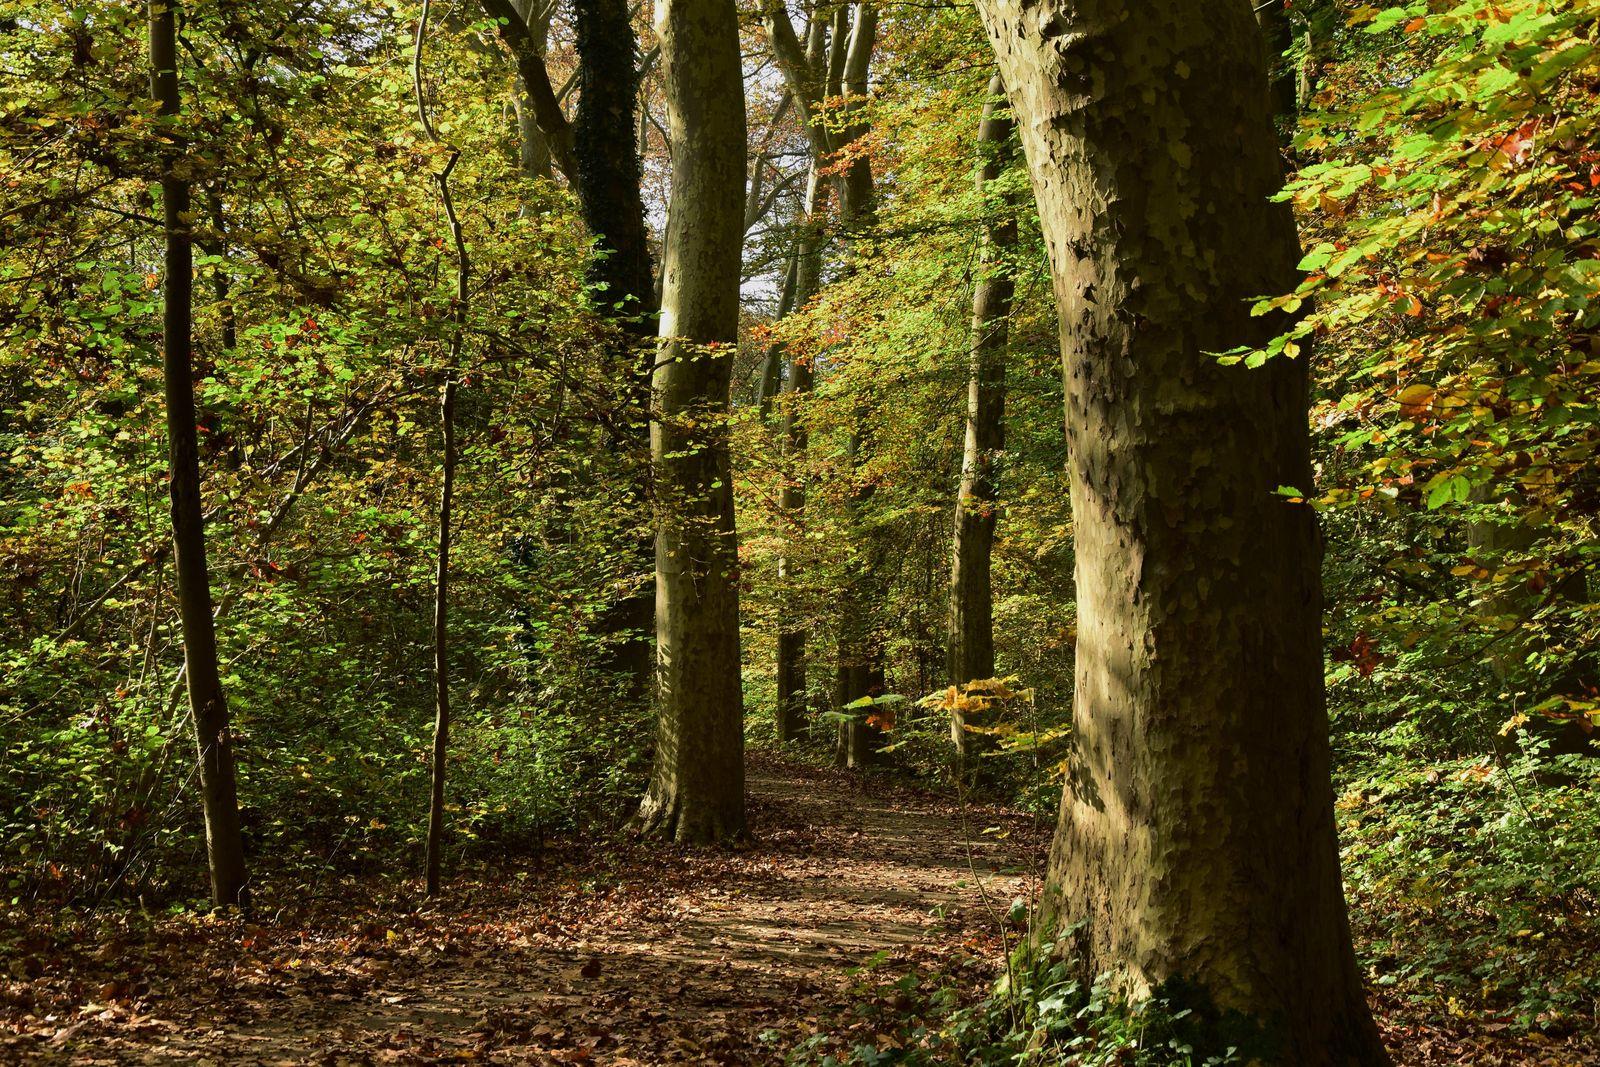 La forêt du Rhin, pour se promener.